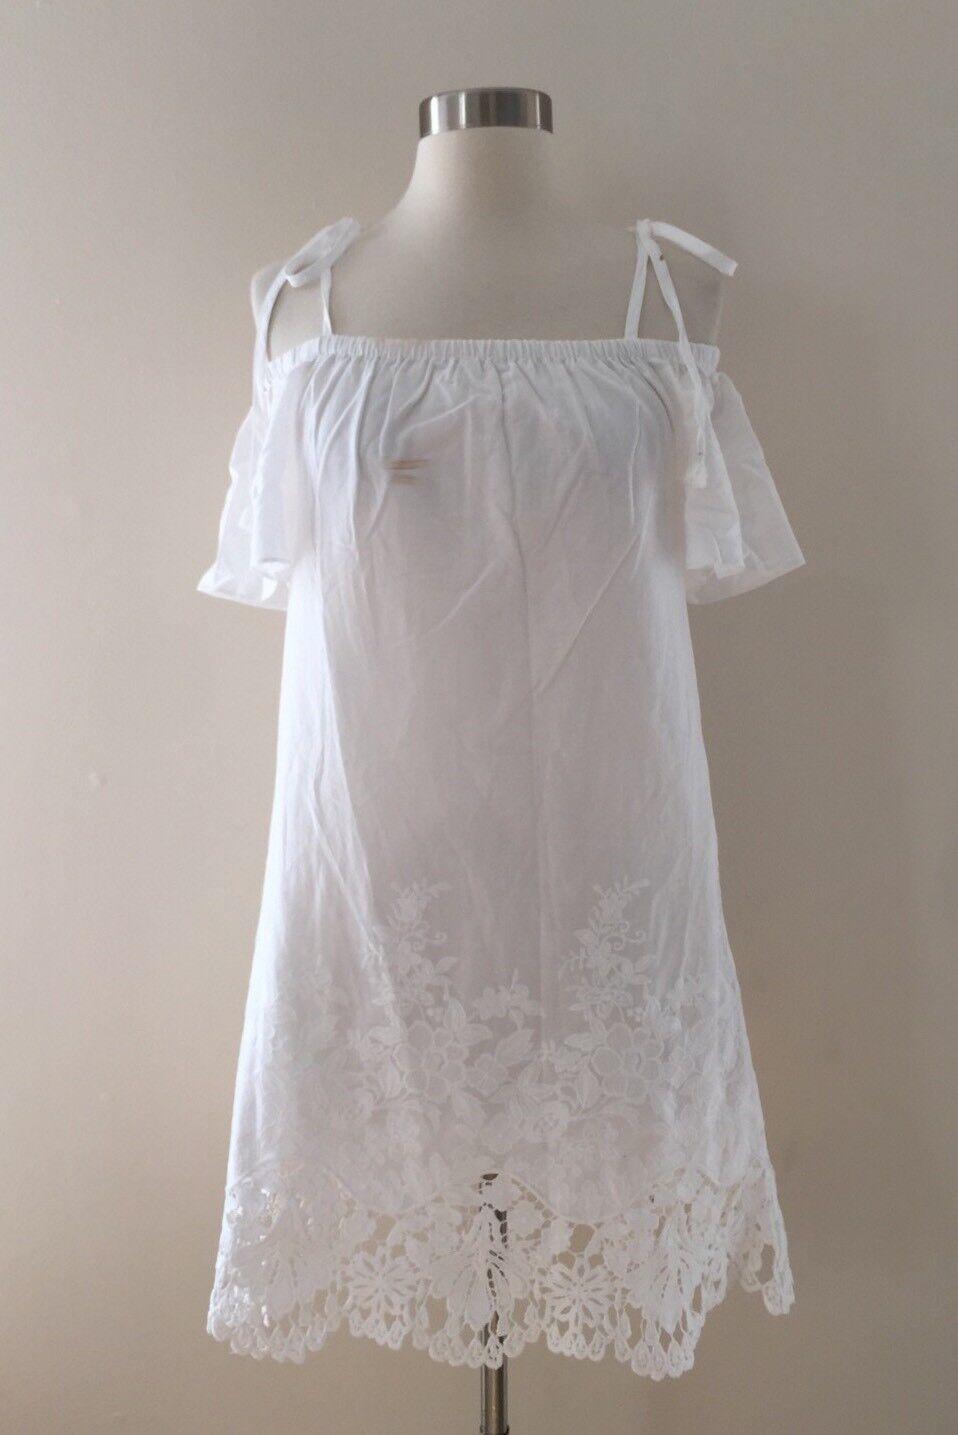 New Madewell JCREW Eyelet Cold-Shoulder Dress White Size XS G6075